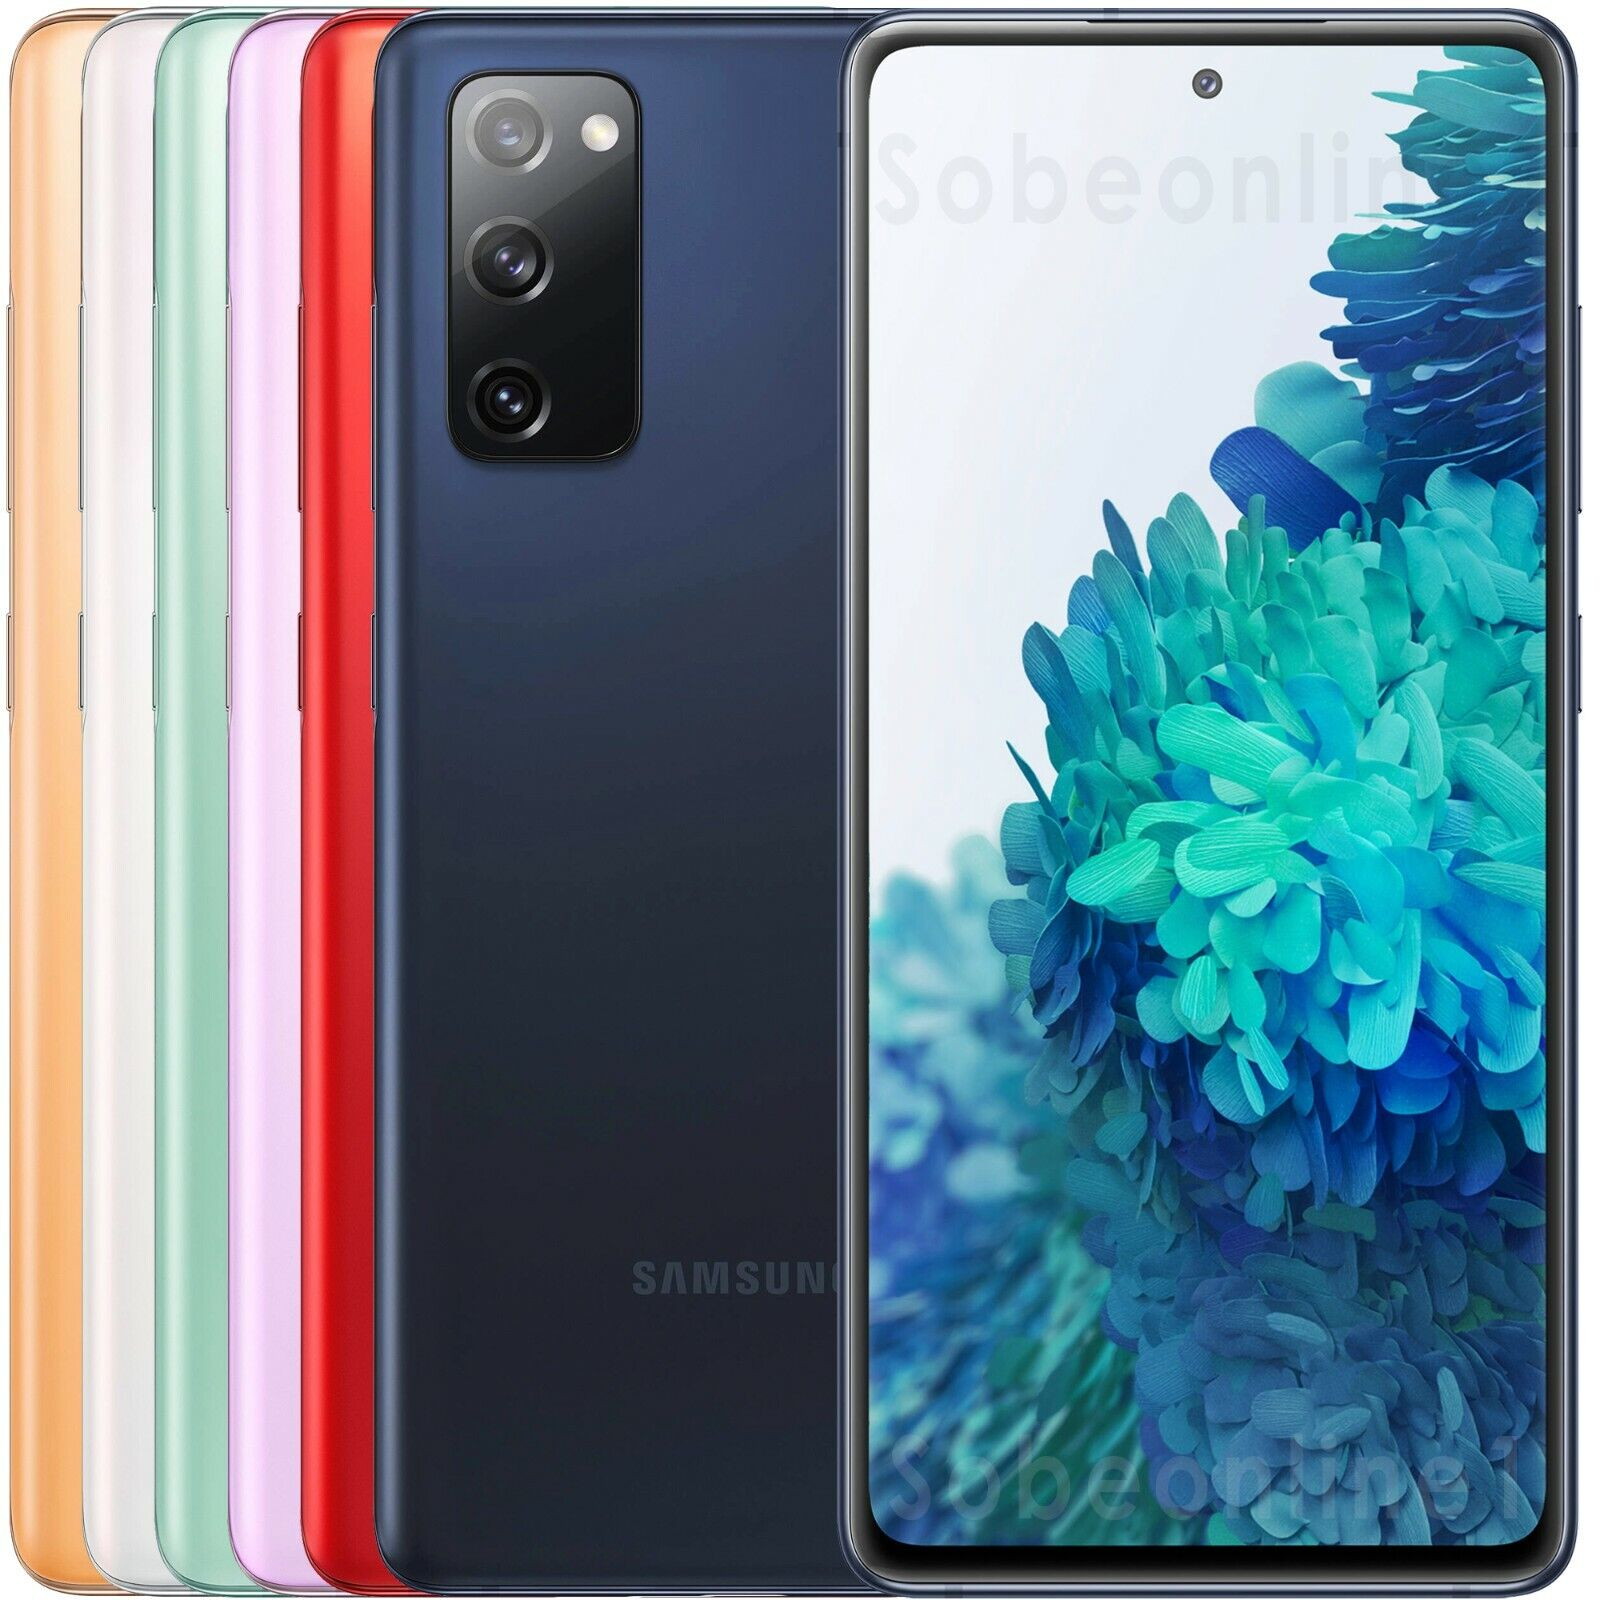 "Android Phone - Samsung Galaxy S20 FE 128GB/8GB RAM SM-G780F/DSM (FACTORY UNLOCKED) 6.5"""